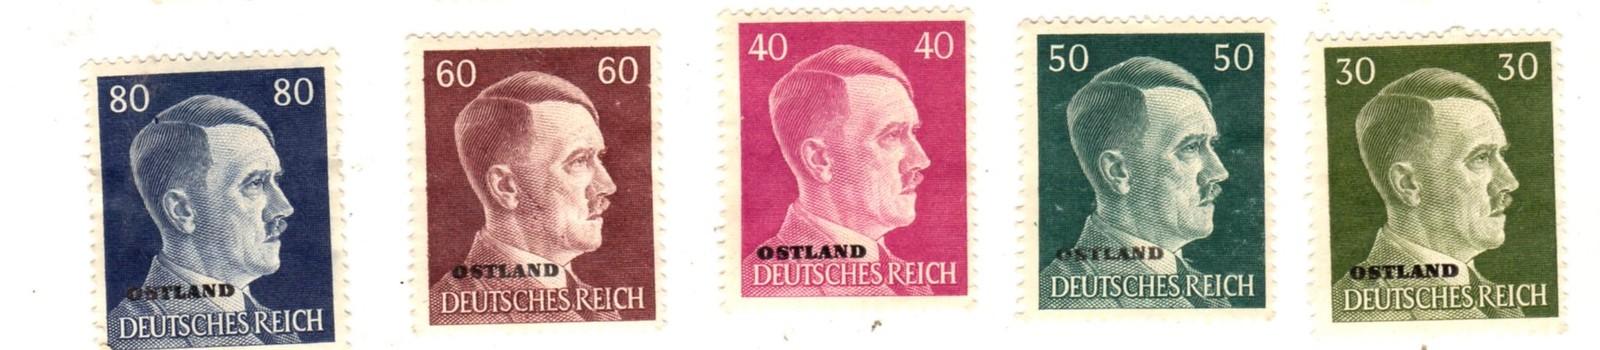 Stamps - Germany- European Postage -Germany (25 vintage stamps) image 3